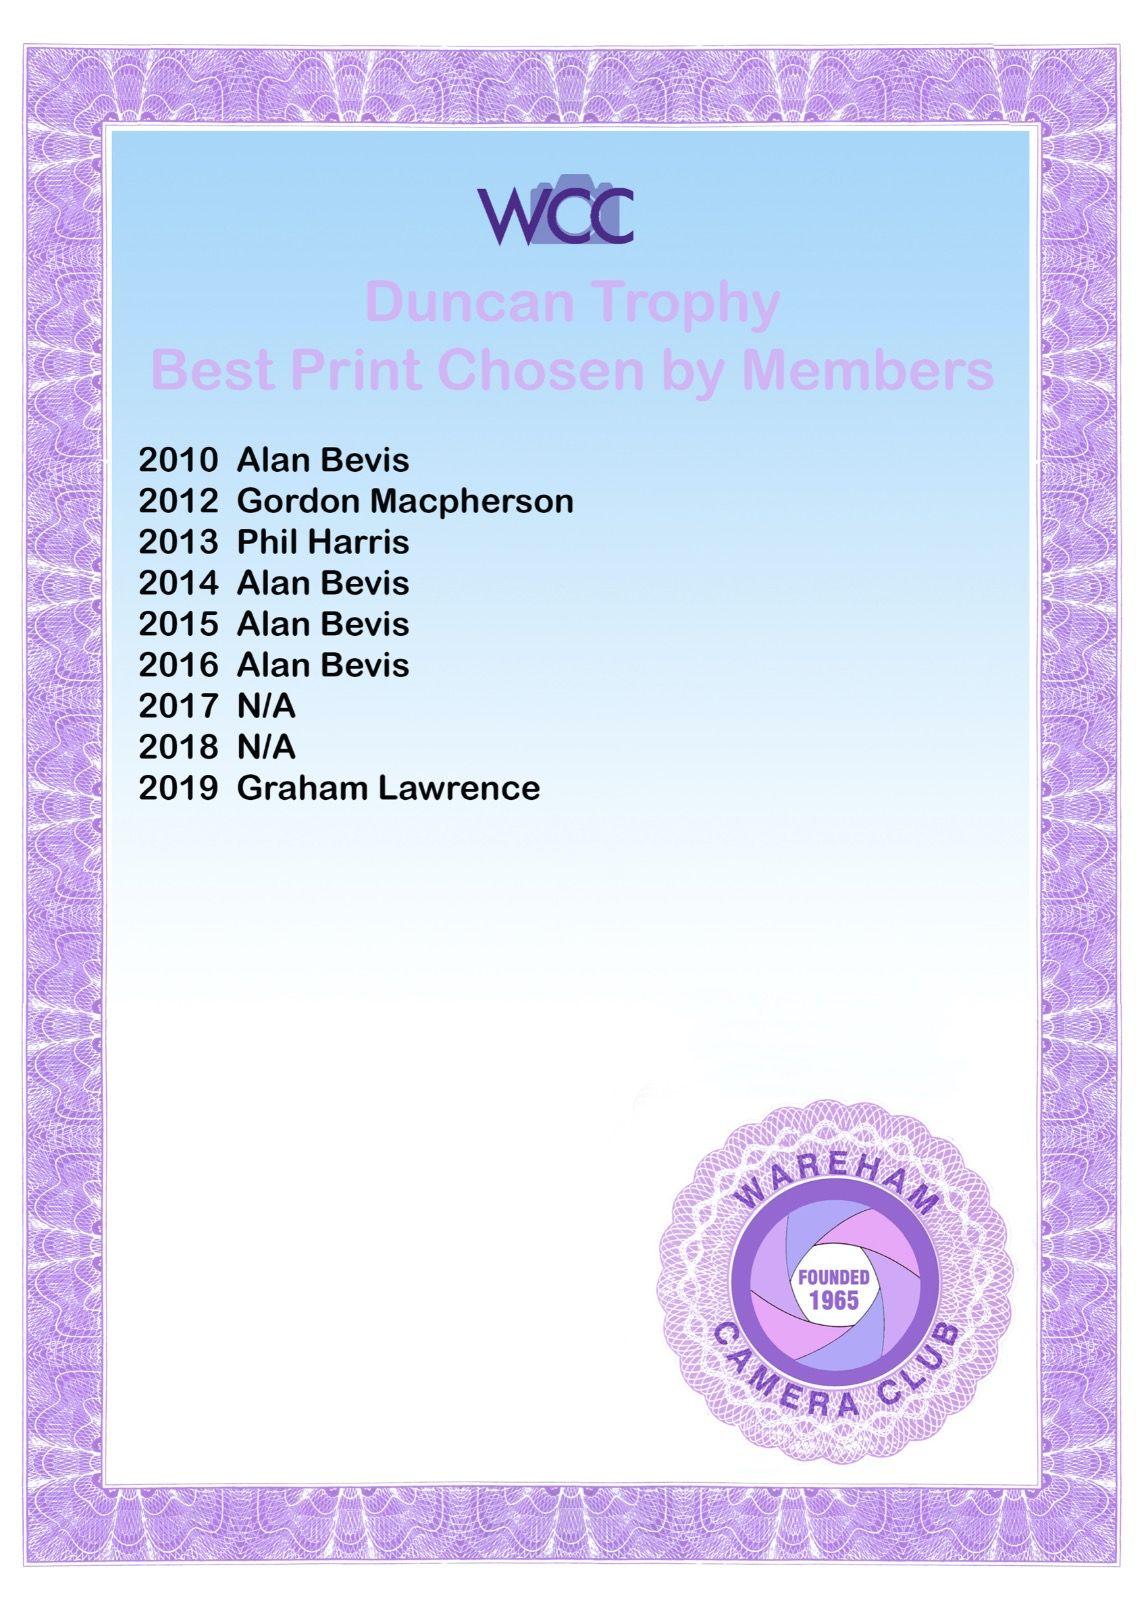 Duncan Trophy